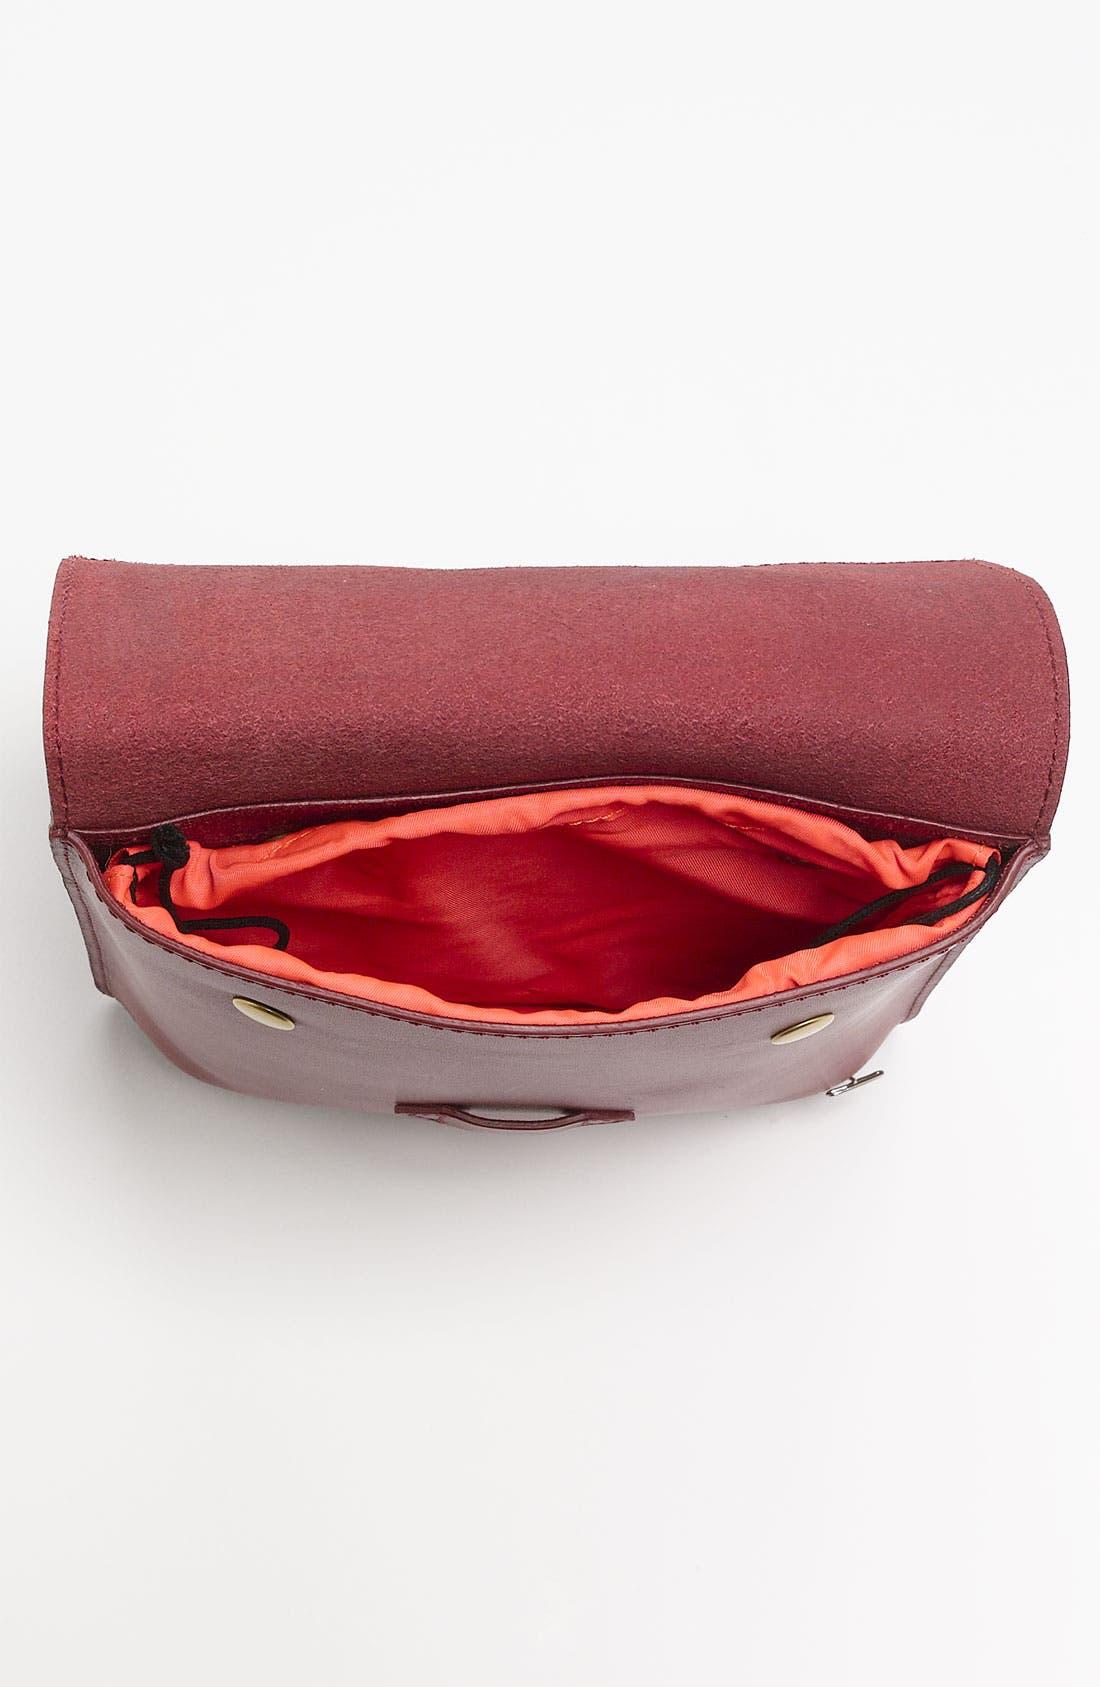 Alternate Image 3  - IIIBeCa By Joy Gryson 'Chambers Street' Crossbody Bag